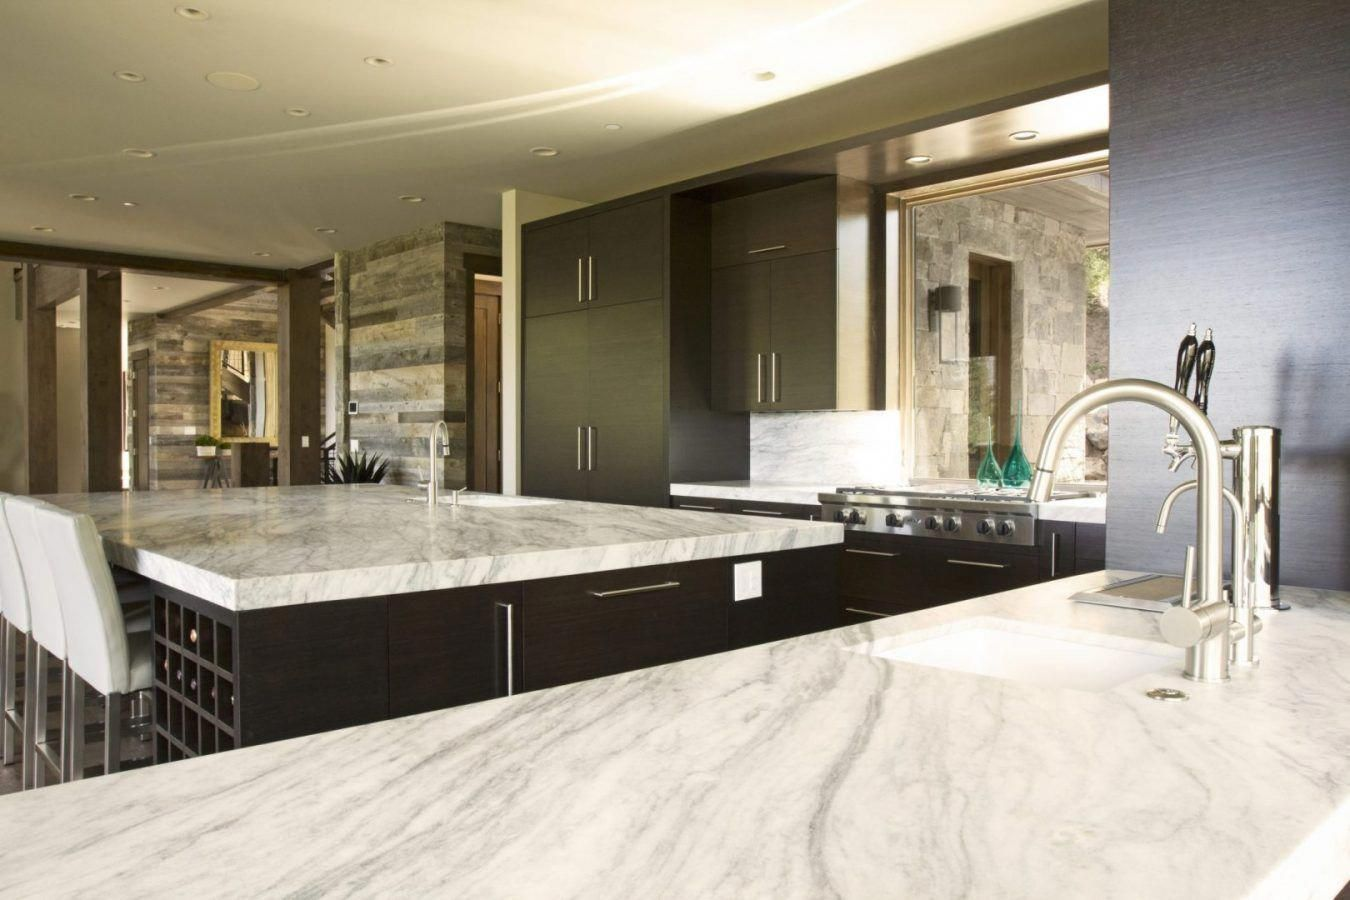 Perfect space for entertaining.   #teerlinkcabinet #kitchen #island #kitchenisland #luxuryhomes #kitchencabinets #kitchendesign #contemporarykitchen #contemporary #contemporarycabinets #utahhomes #parkcity #contemporybathroom